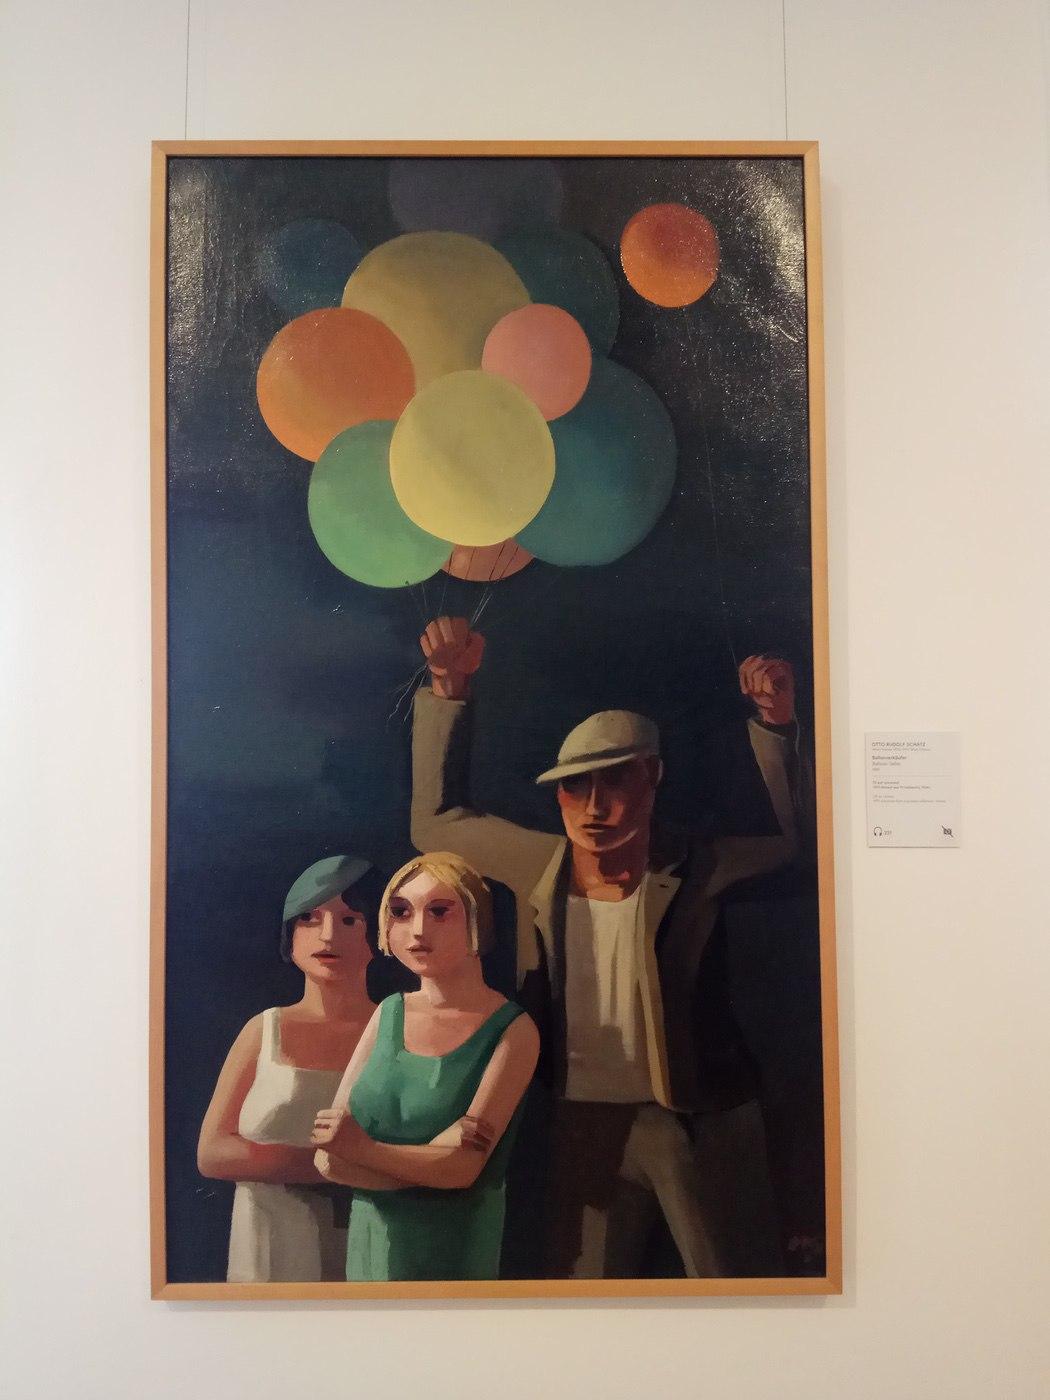 Otto Rudolf Schatz|Balloon Seller